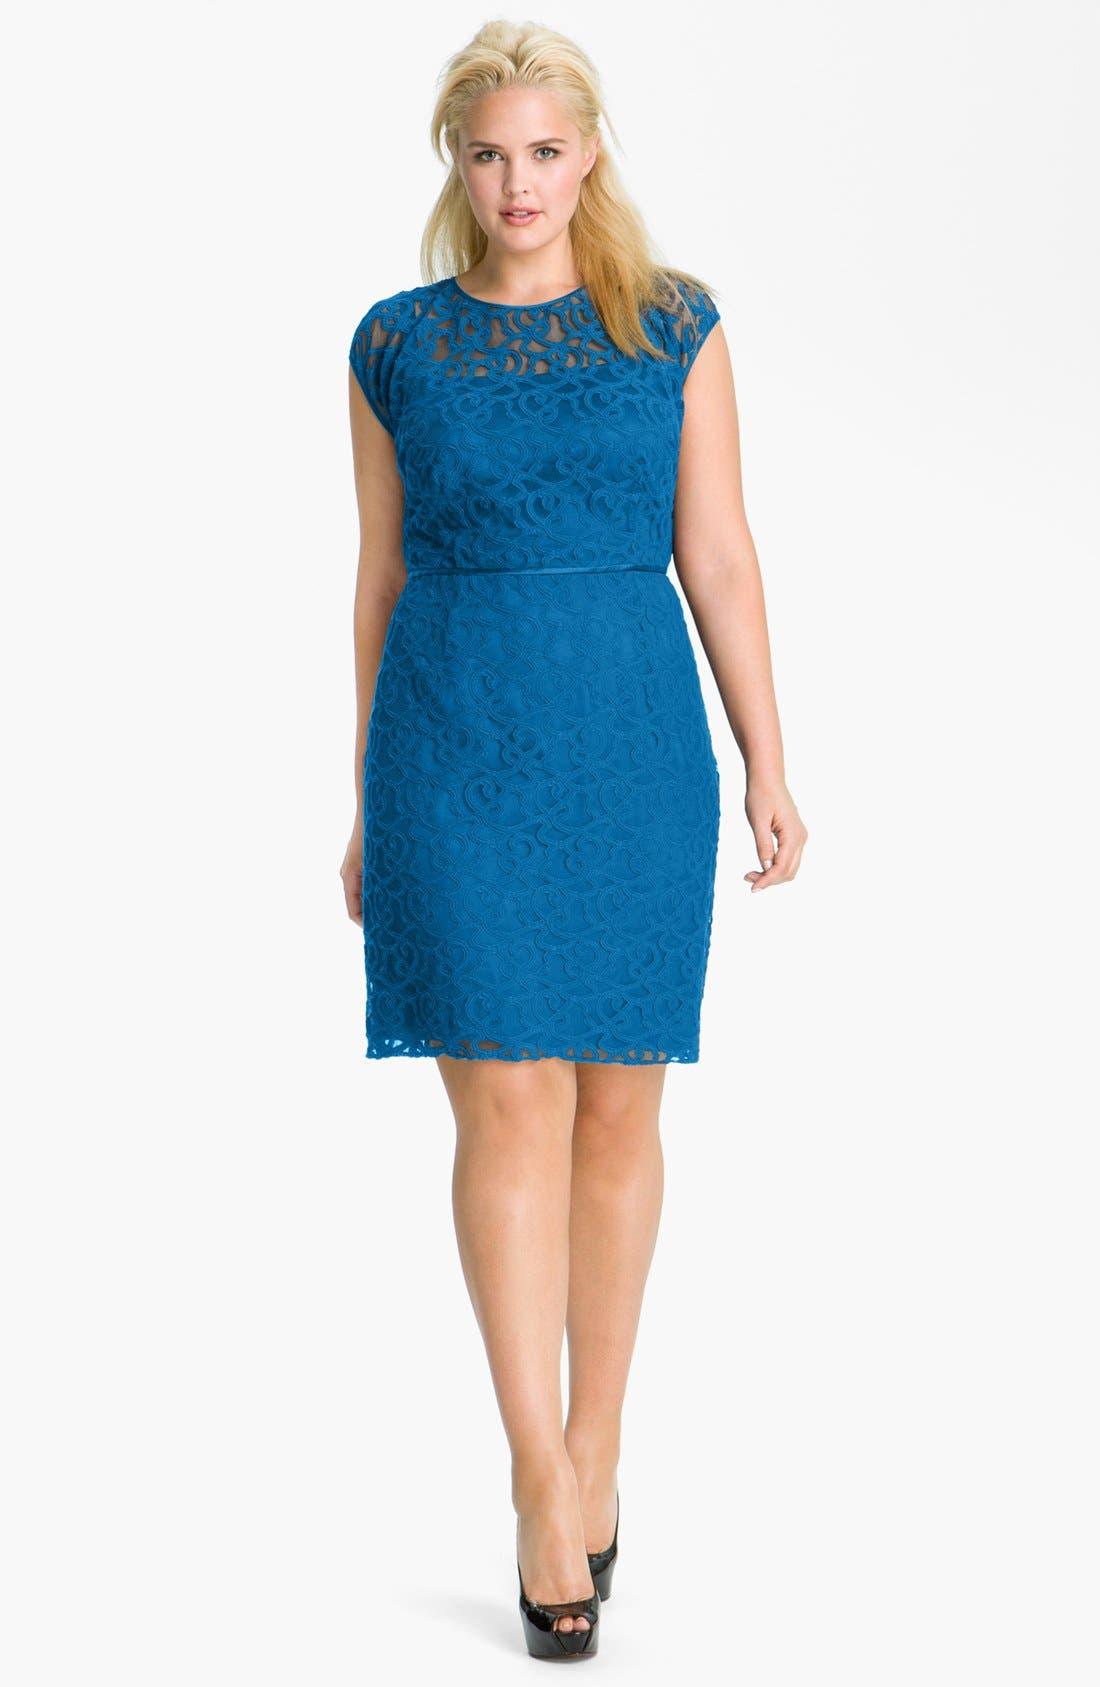 Alternate Image 1 Selected - Adrianna Papell Soutache Illusion Bodice Dress (Plus Size)